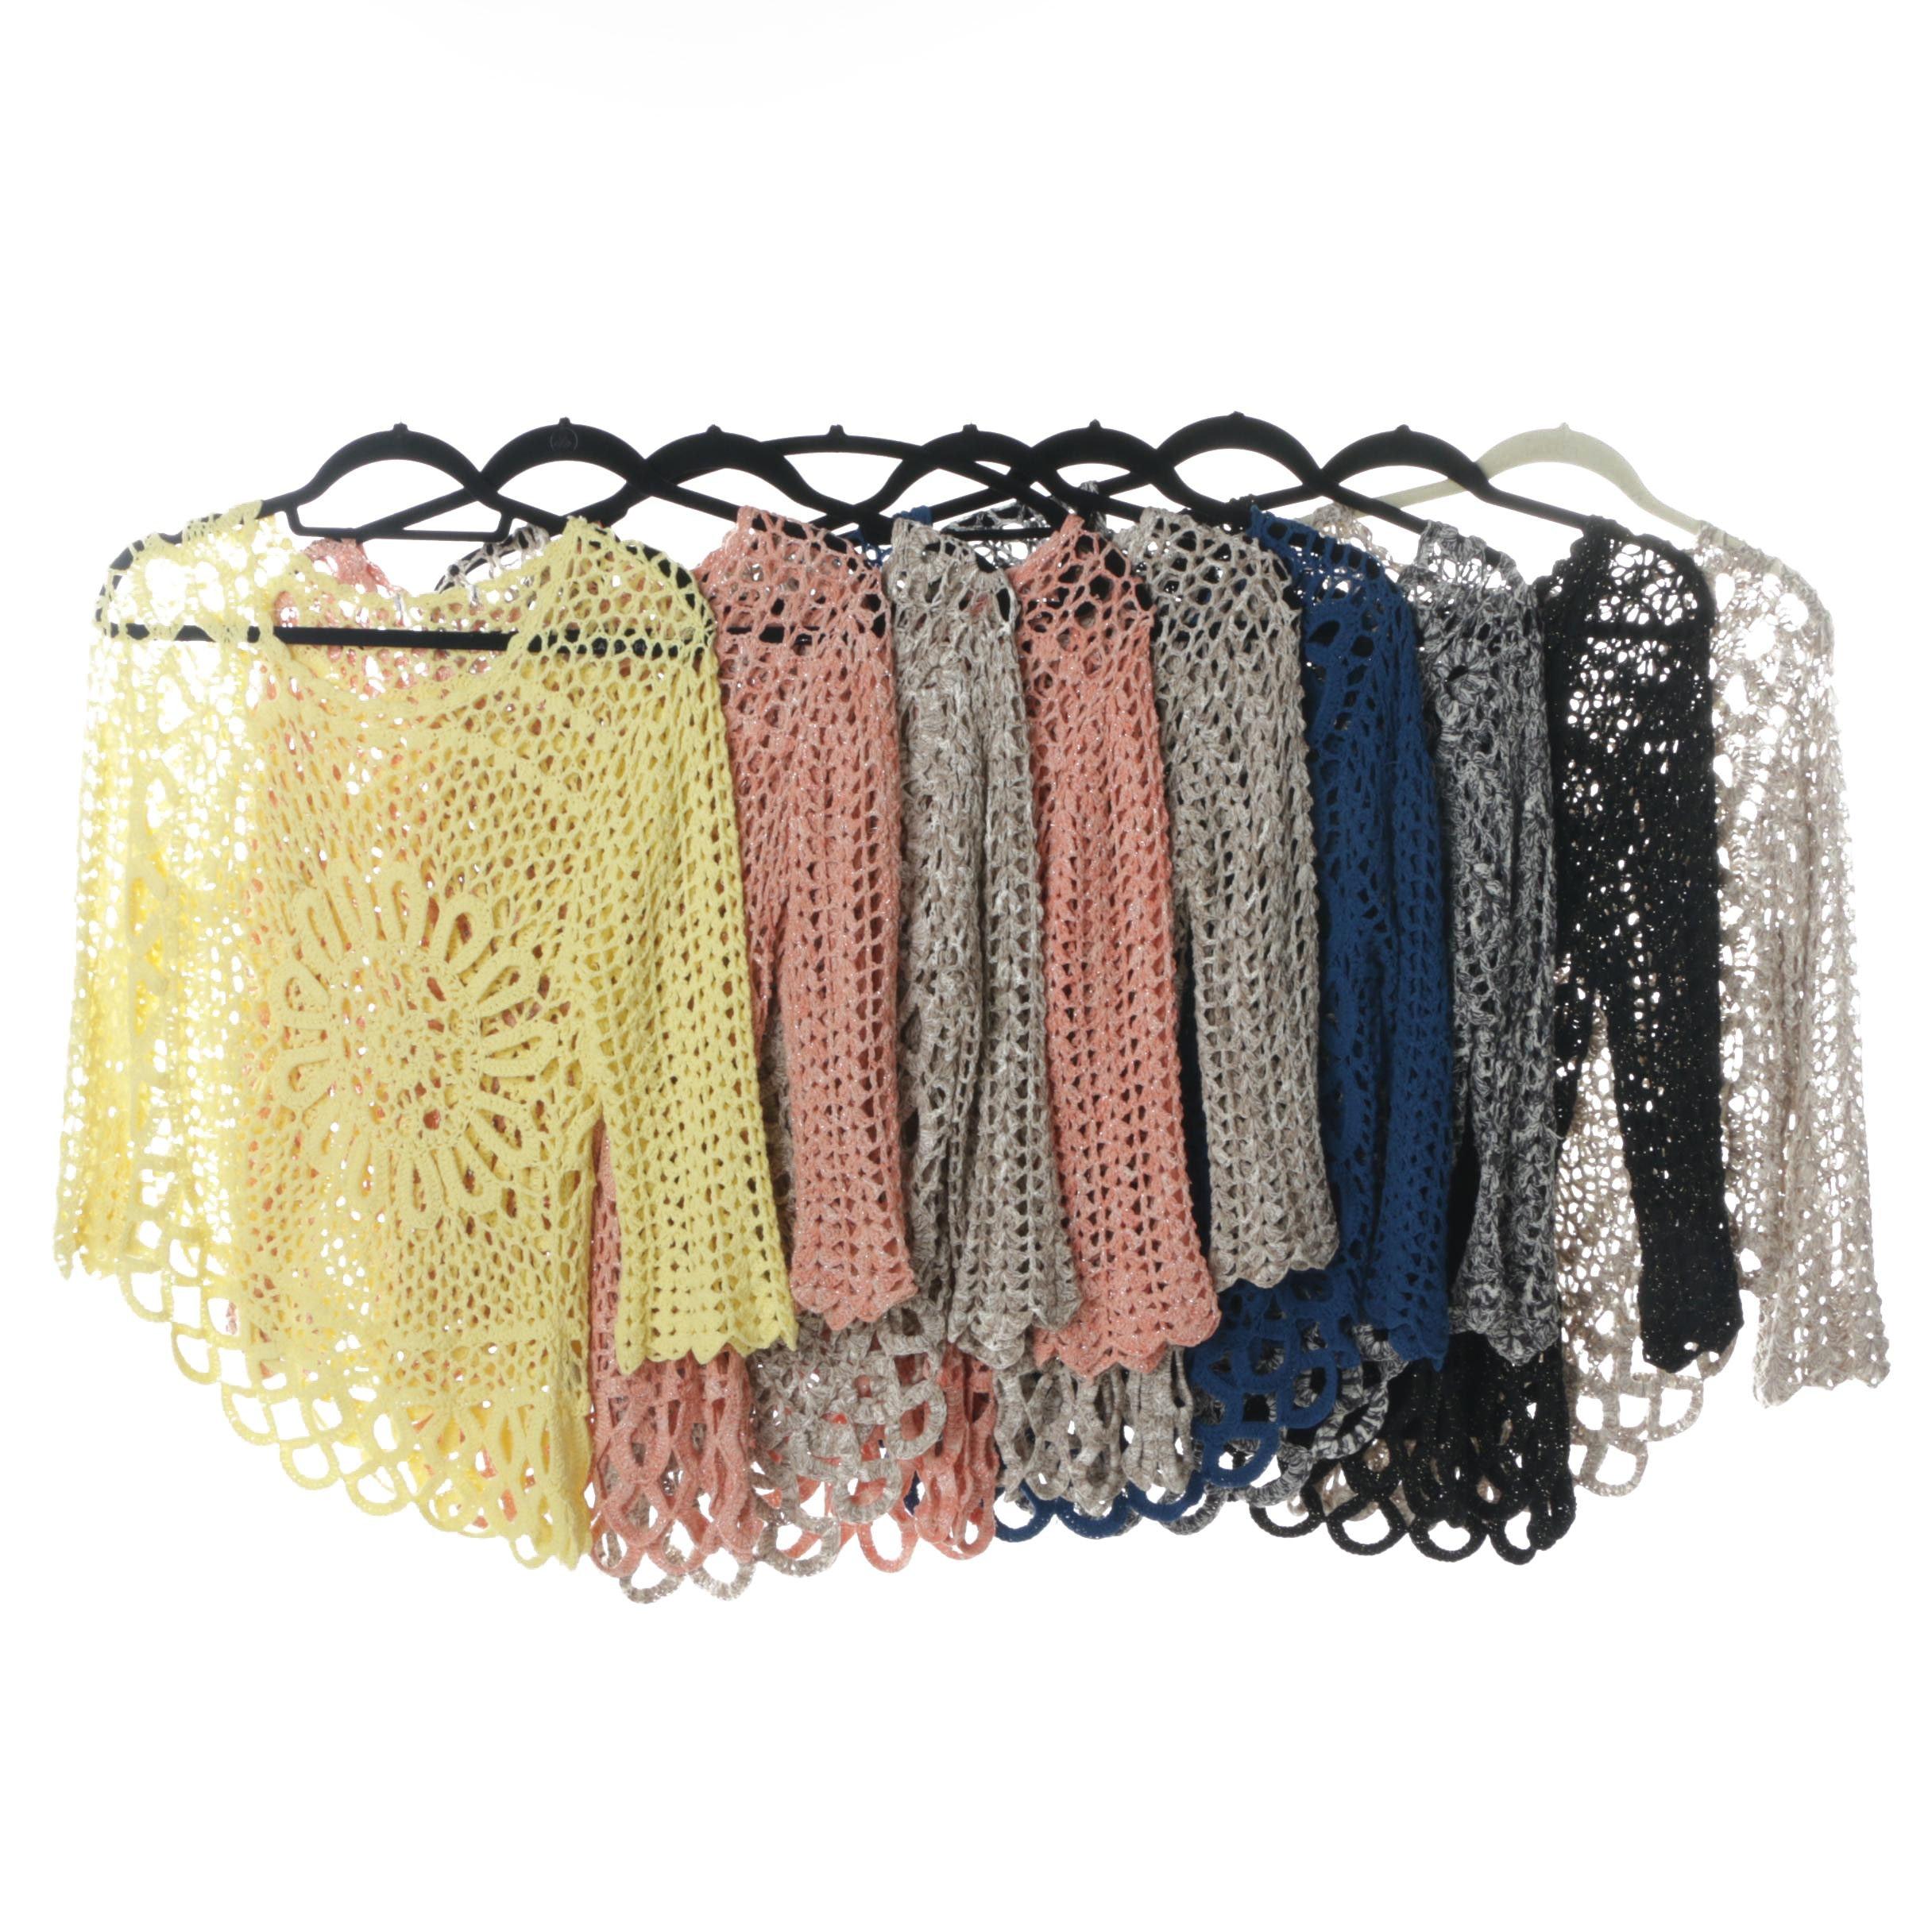 Women's Boston Proper Crocheted Sweater Collection